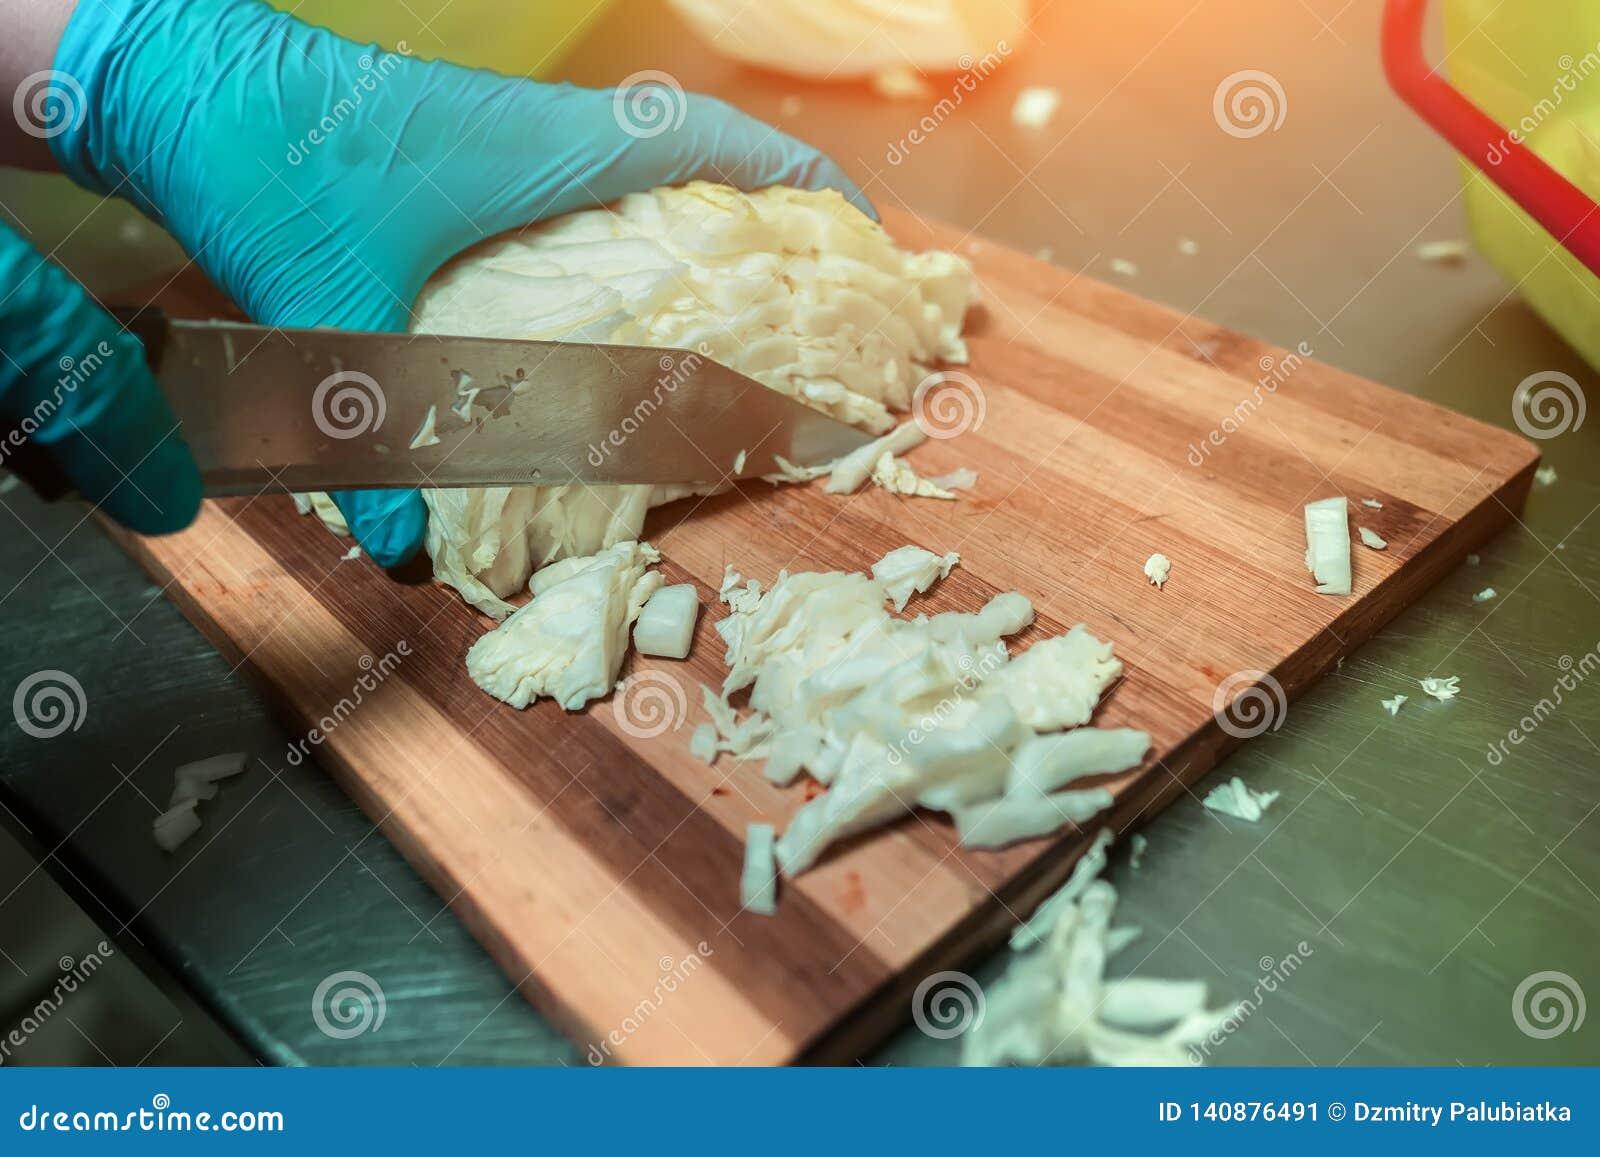 Cook cuts cabbage close-up